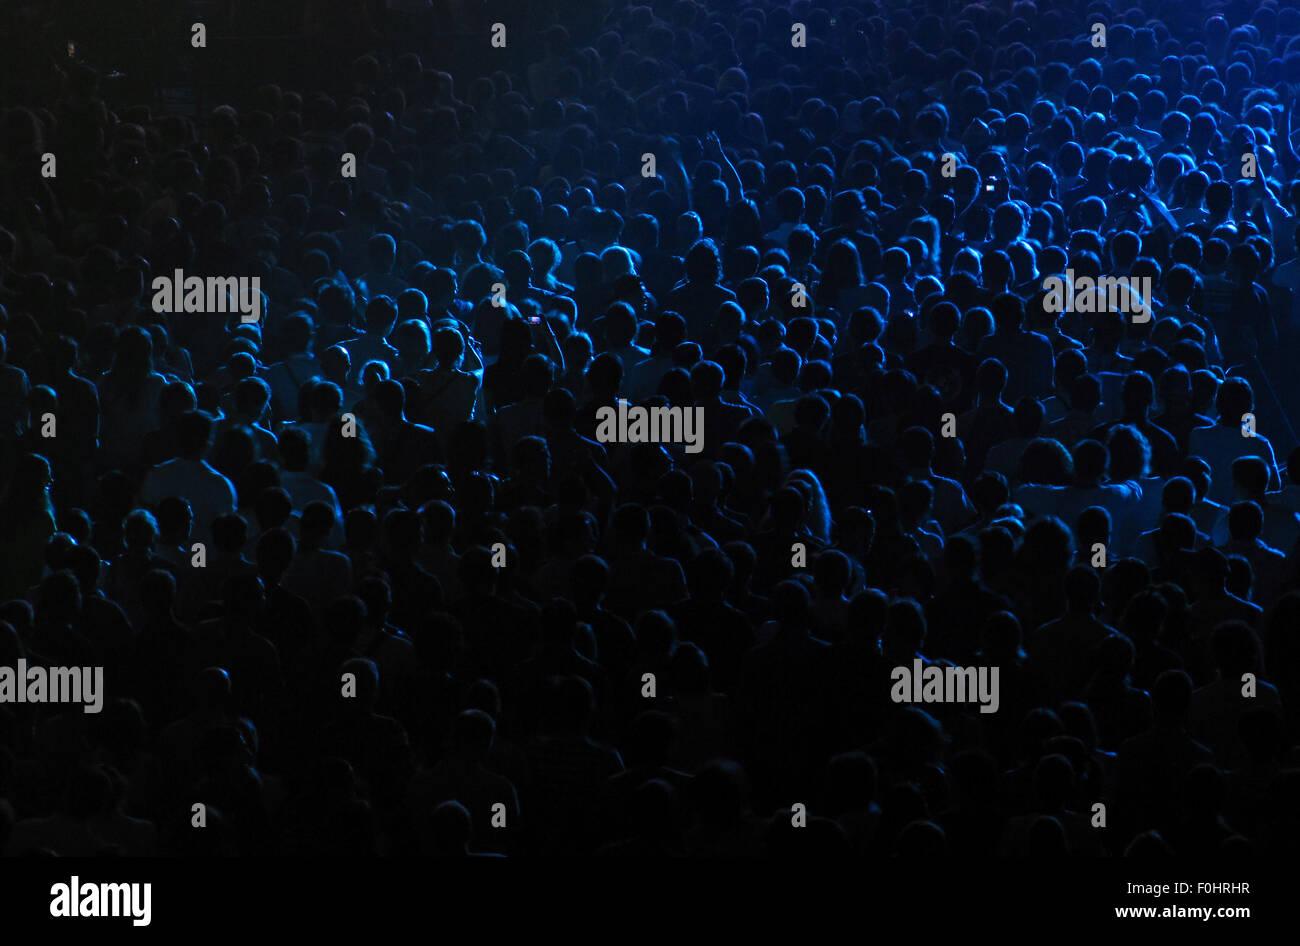 Jubelnde Menge bei der Rock-Konzert im Konzertsaal Stockbild